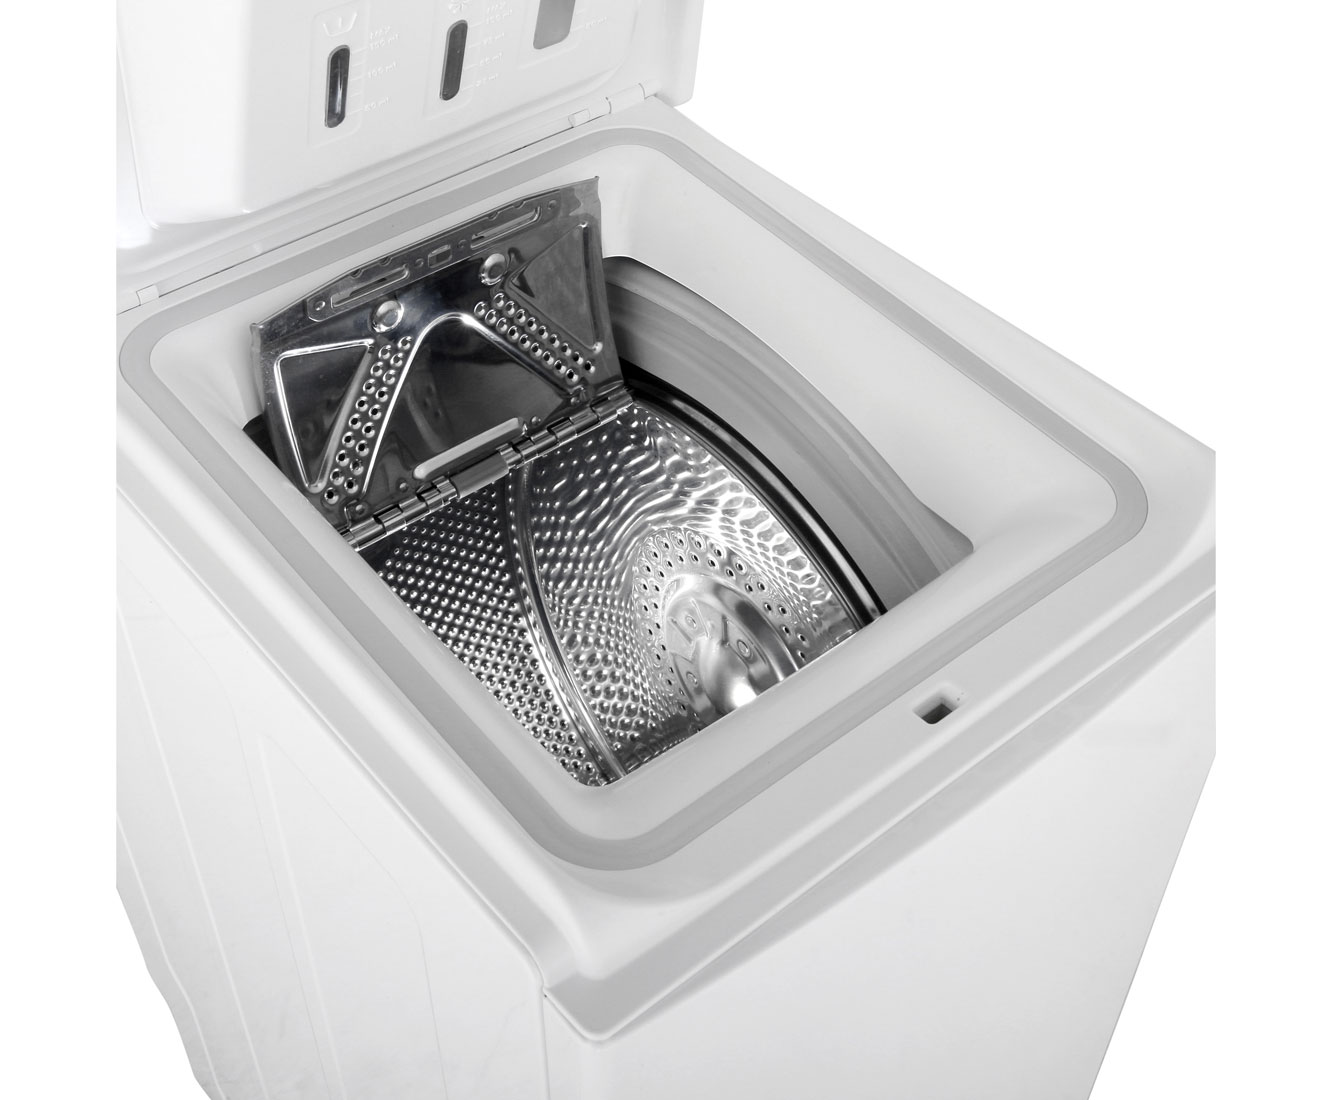 Bauknecht wat prime 752 ps waschmaschine toplader 7 kg 1200 u min